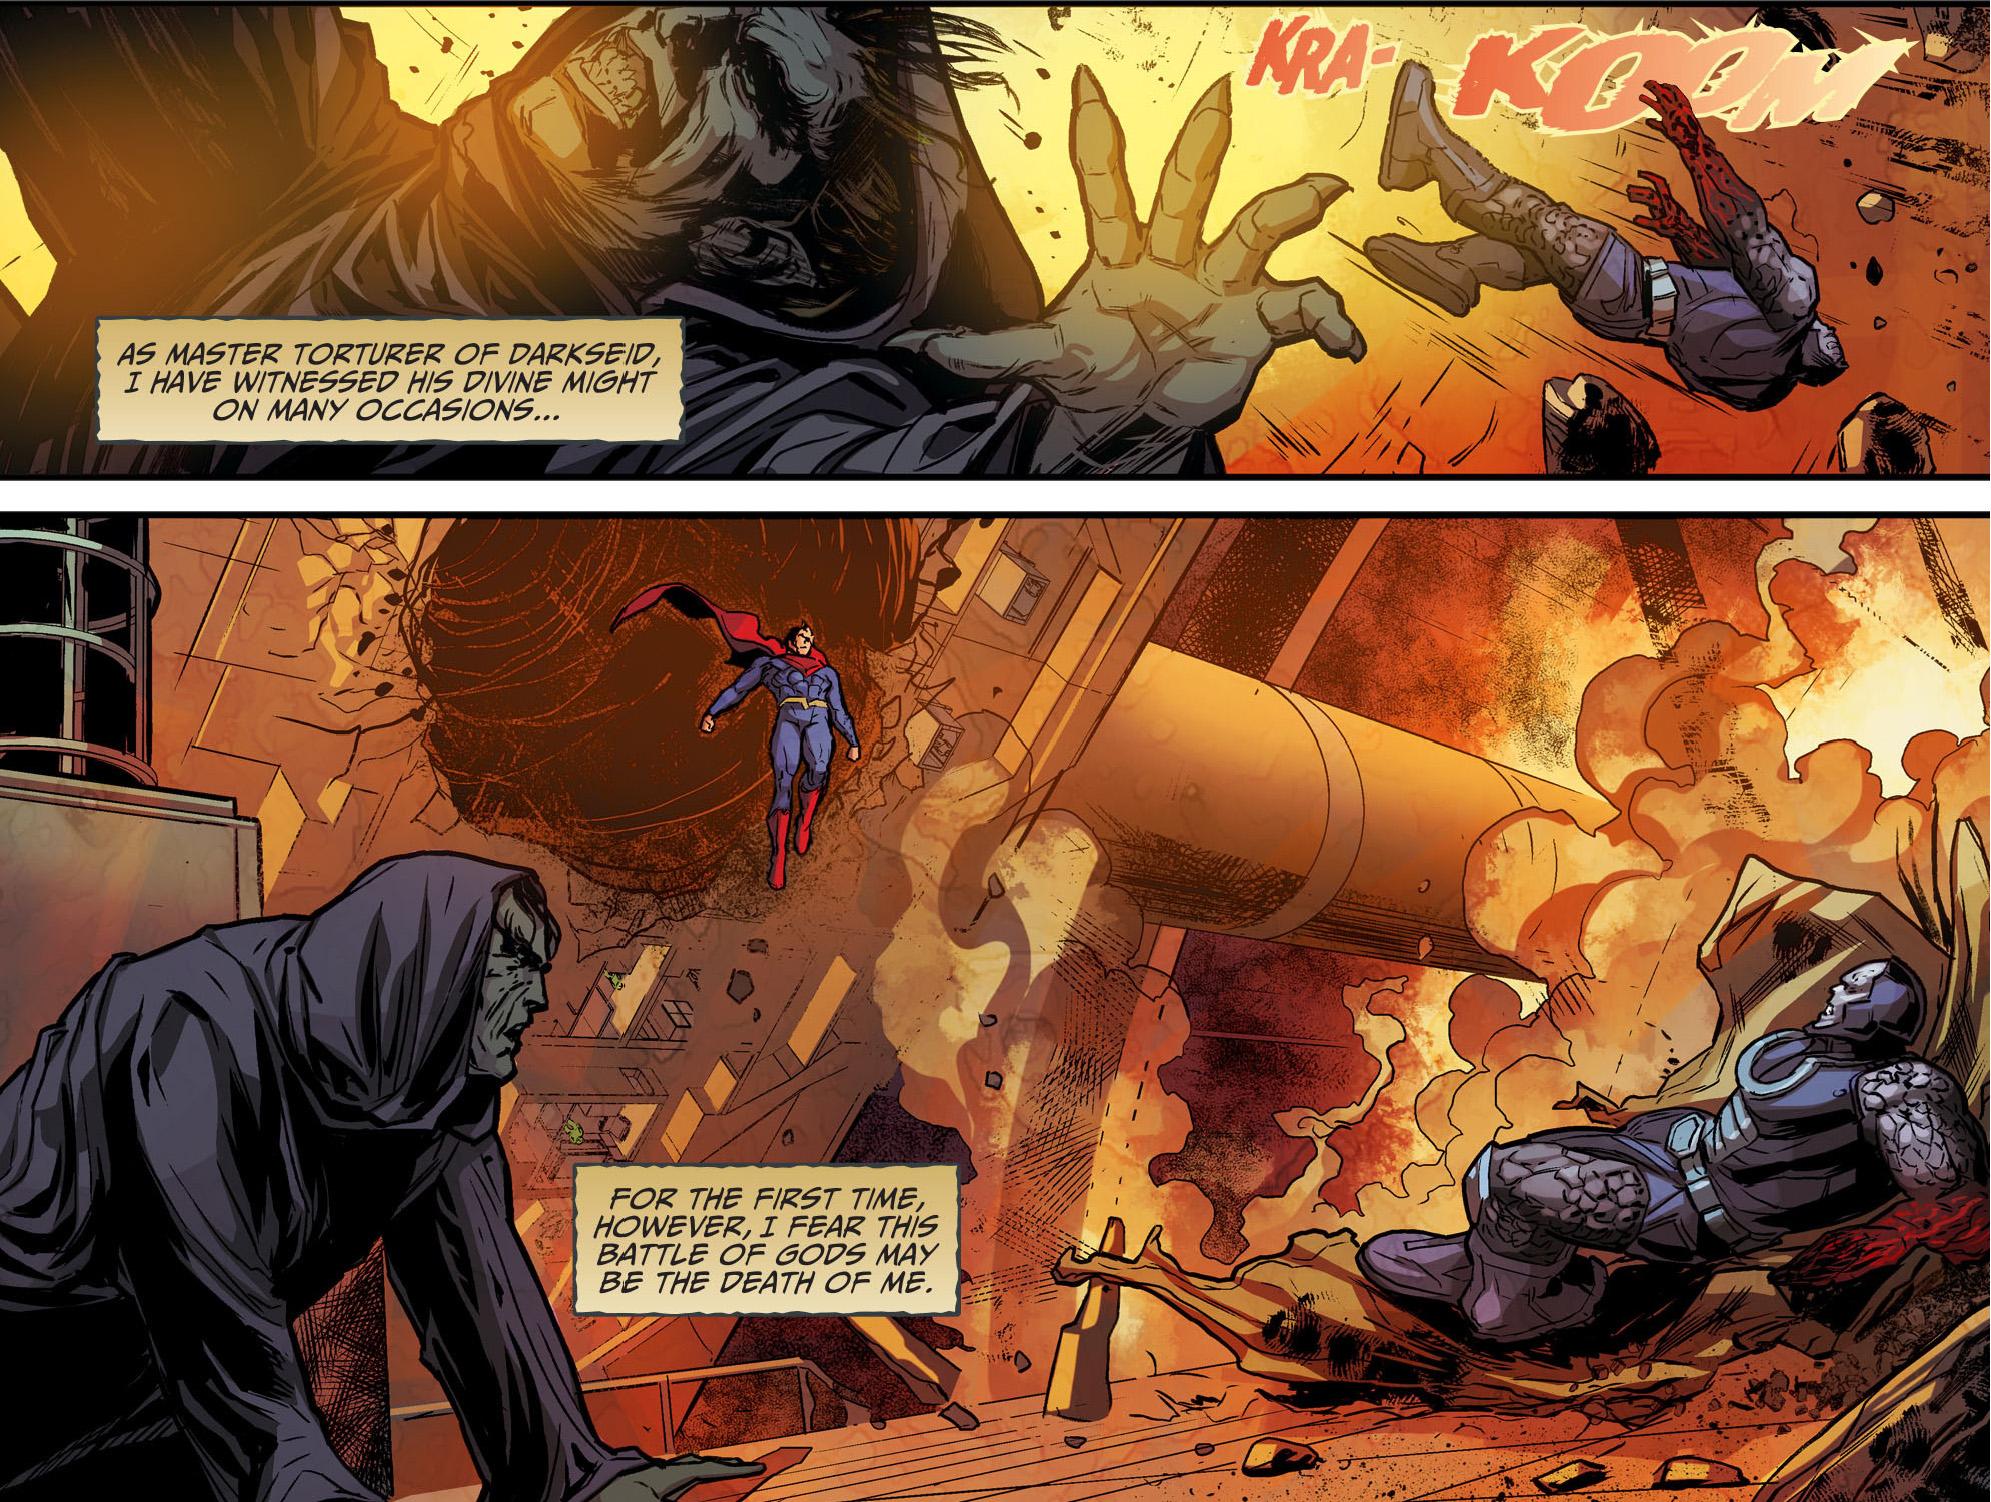 Darkseid VS Superman (Injustice Gods Among Us) | Comicnewbies